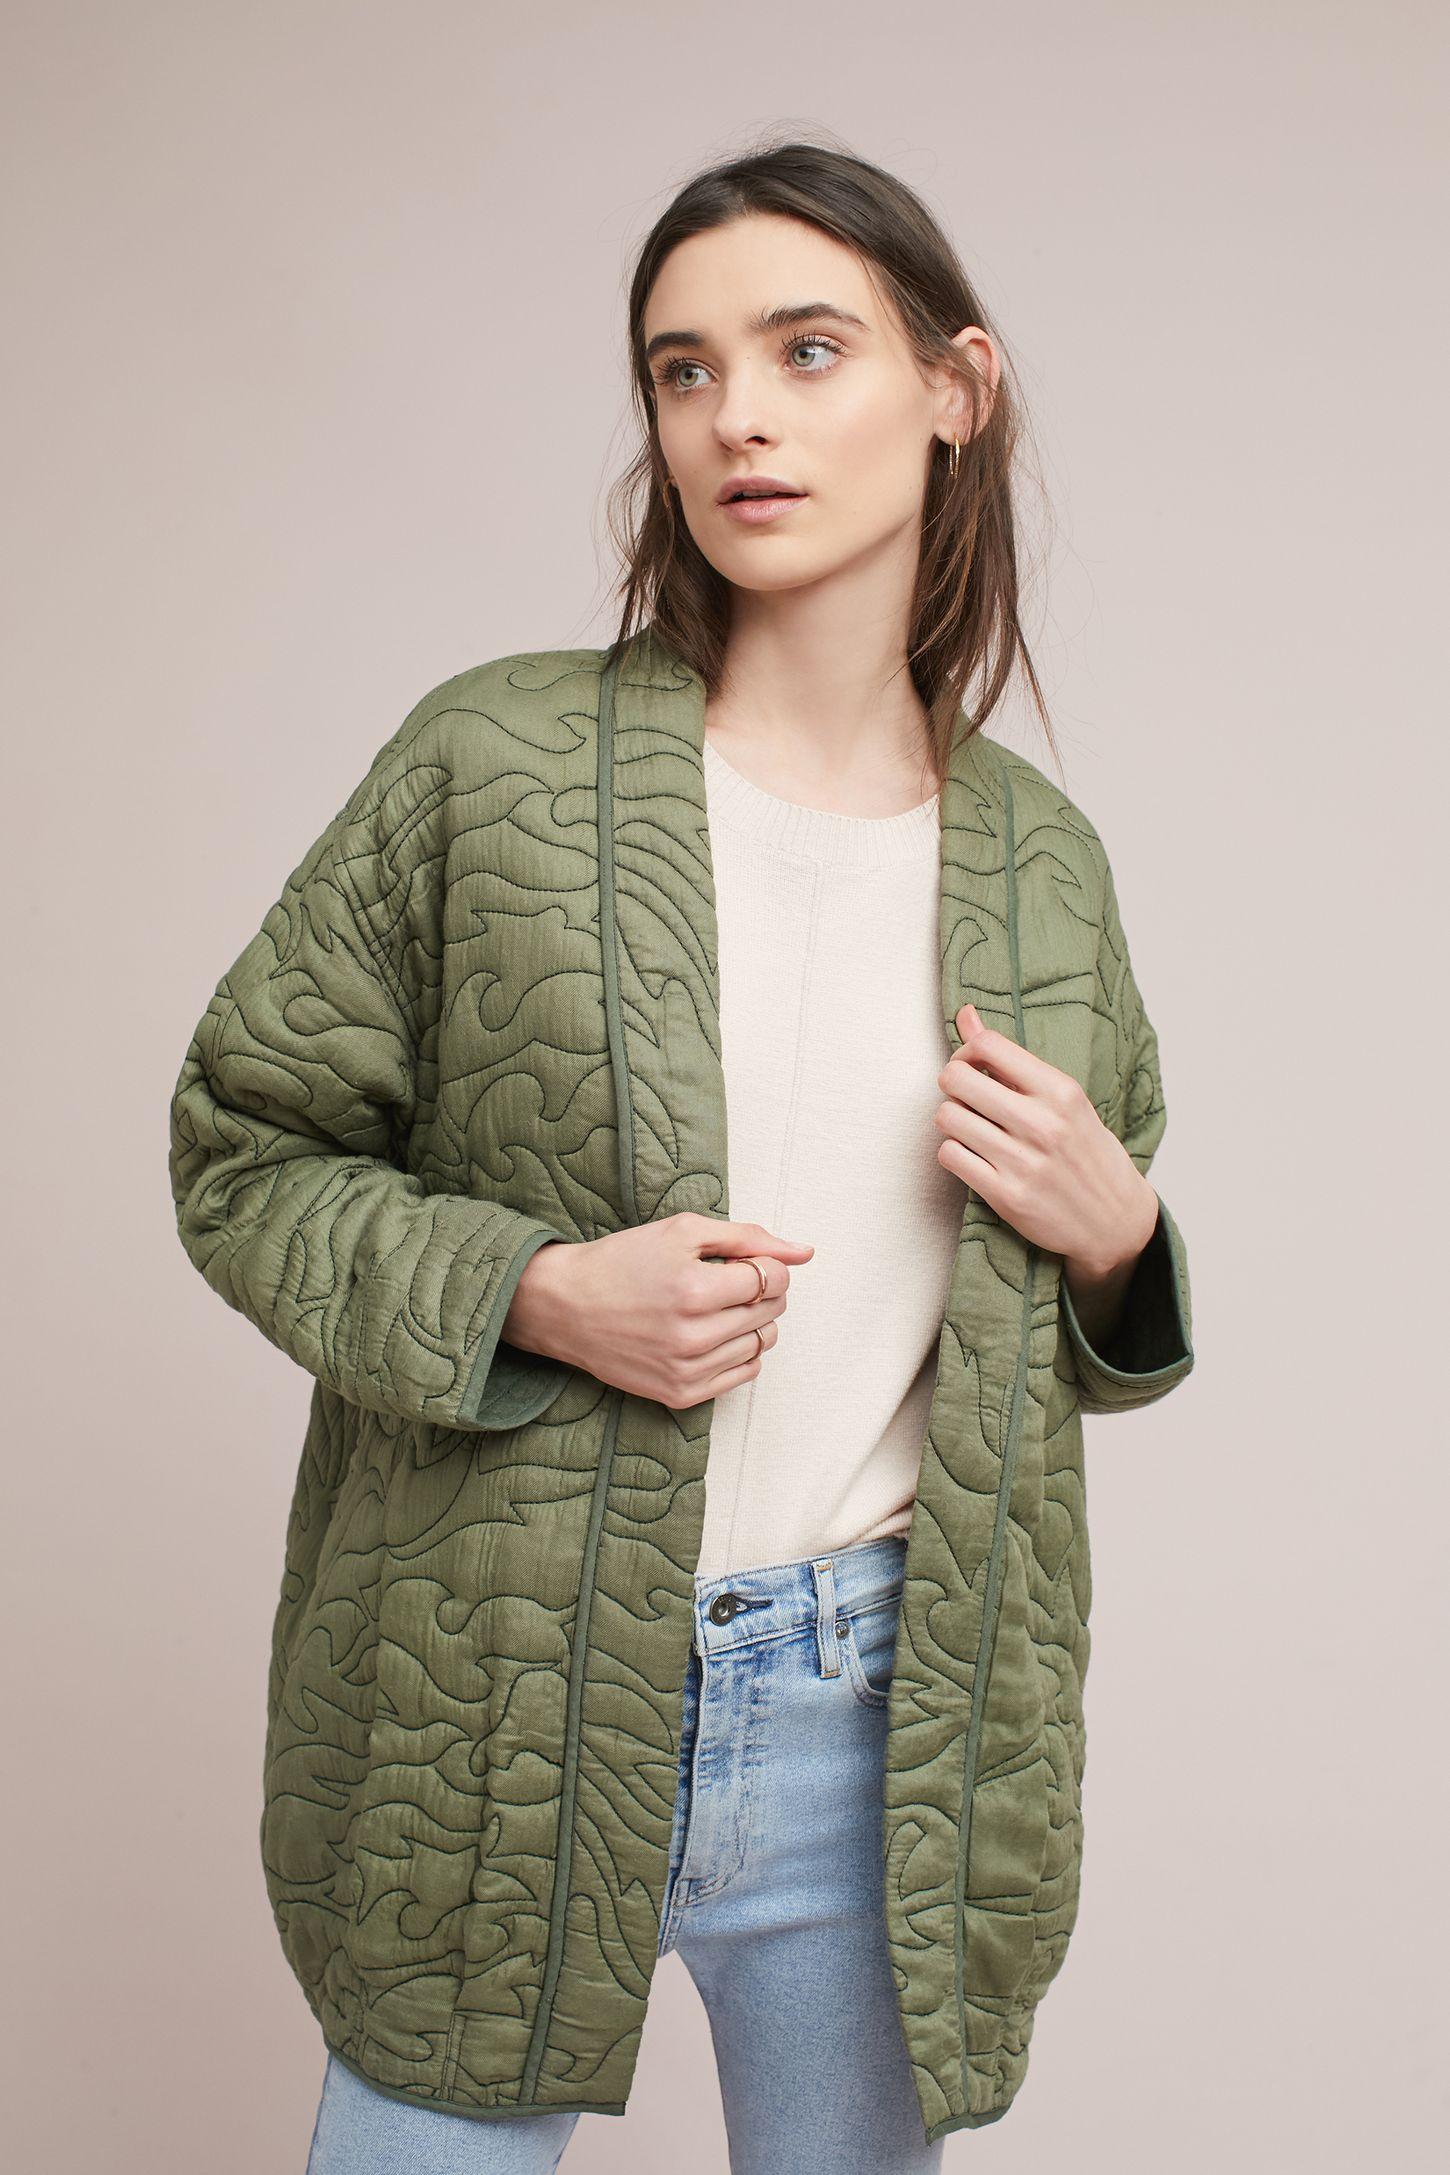 Jackets | Women's Jackets | Anthropologie